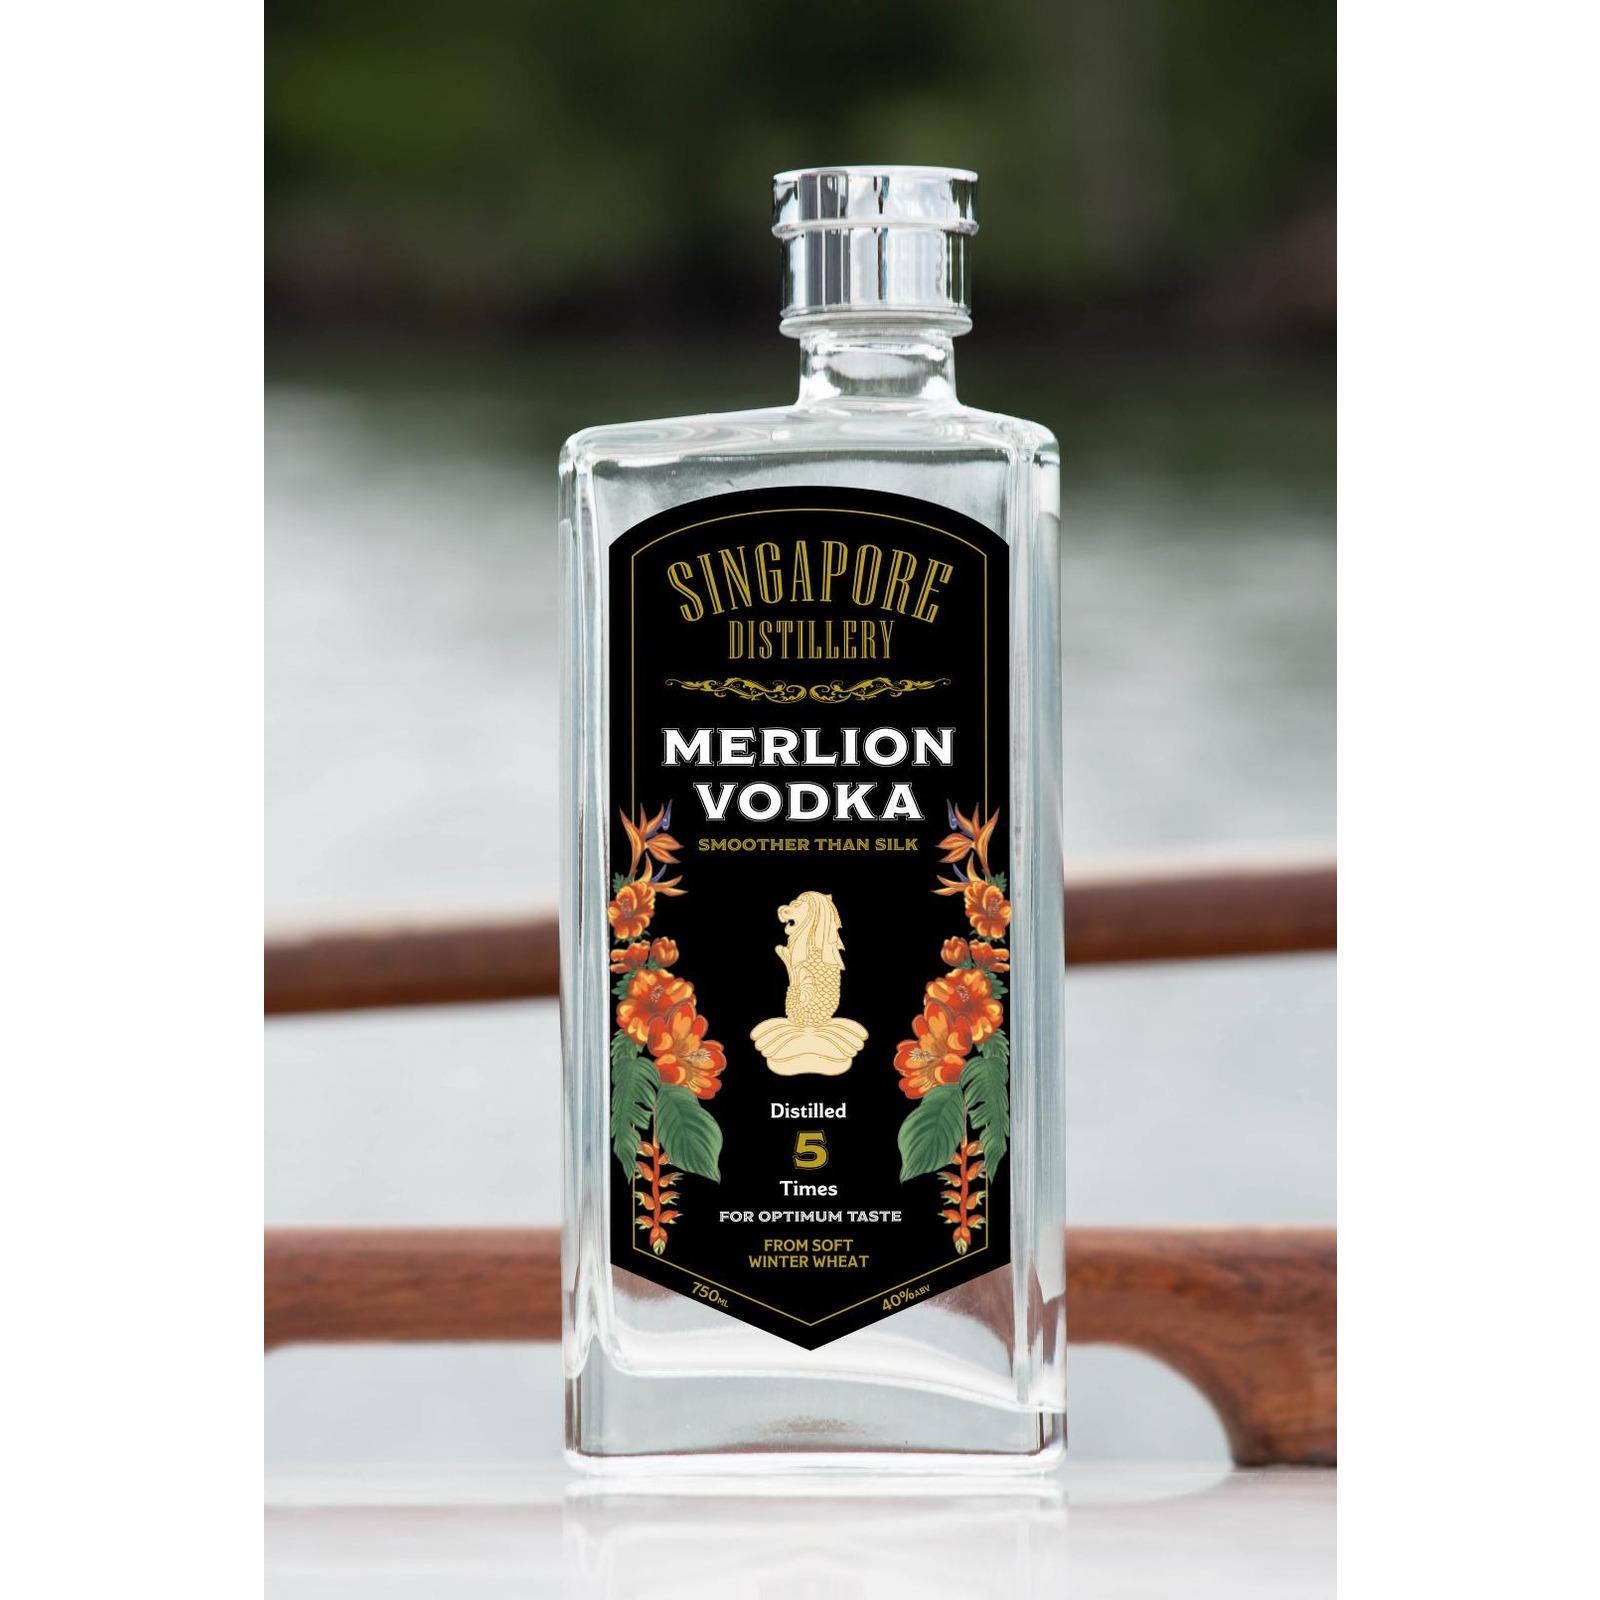 Singapore Distillery Merlion Vodka 750 ML - 40% Alc/Vol